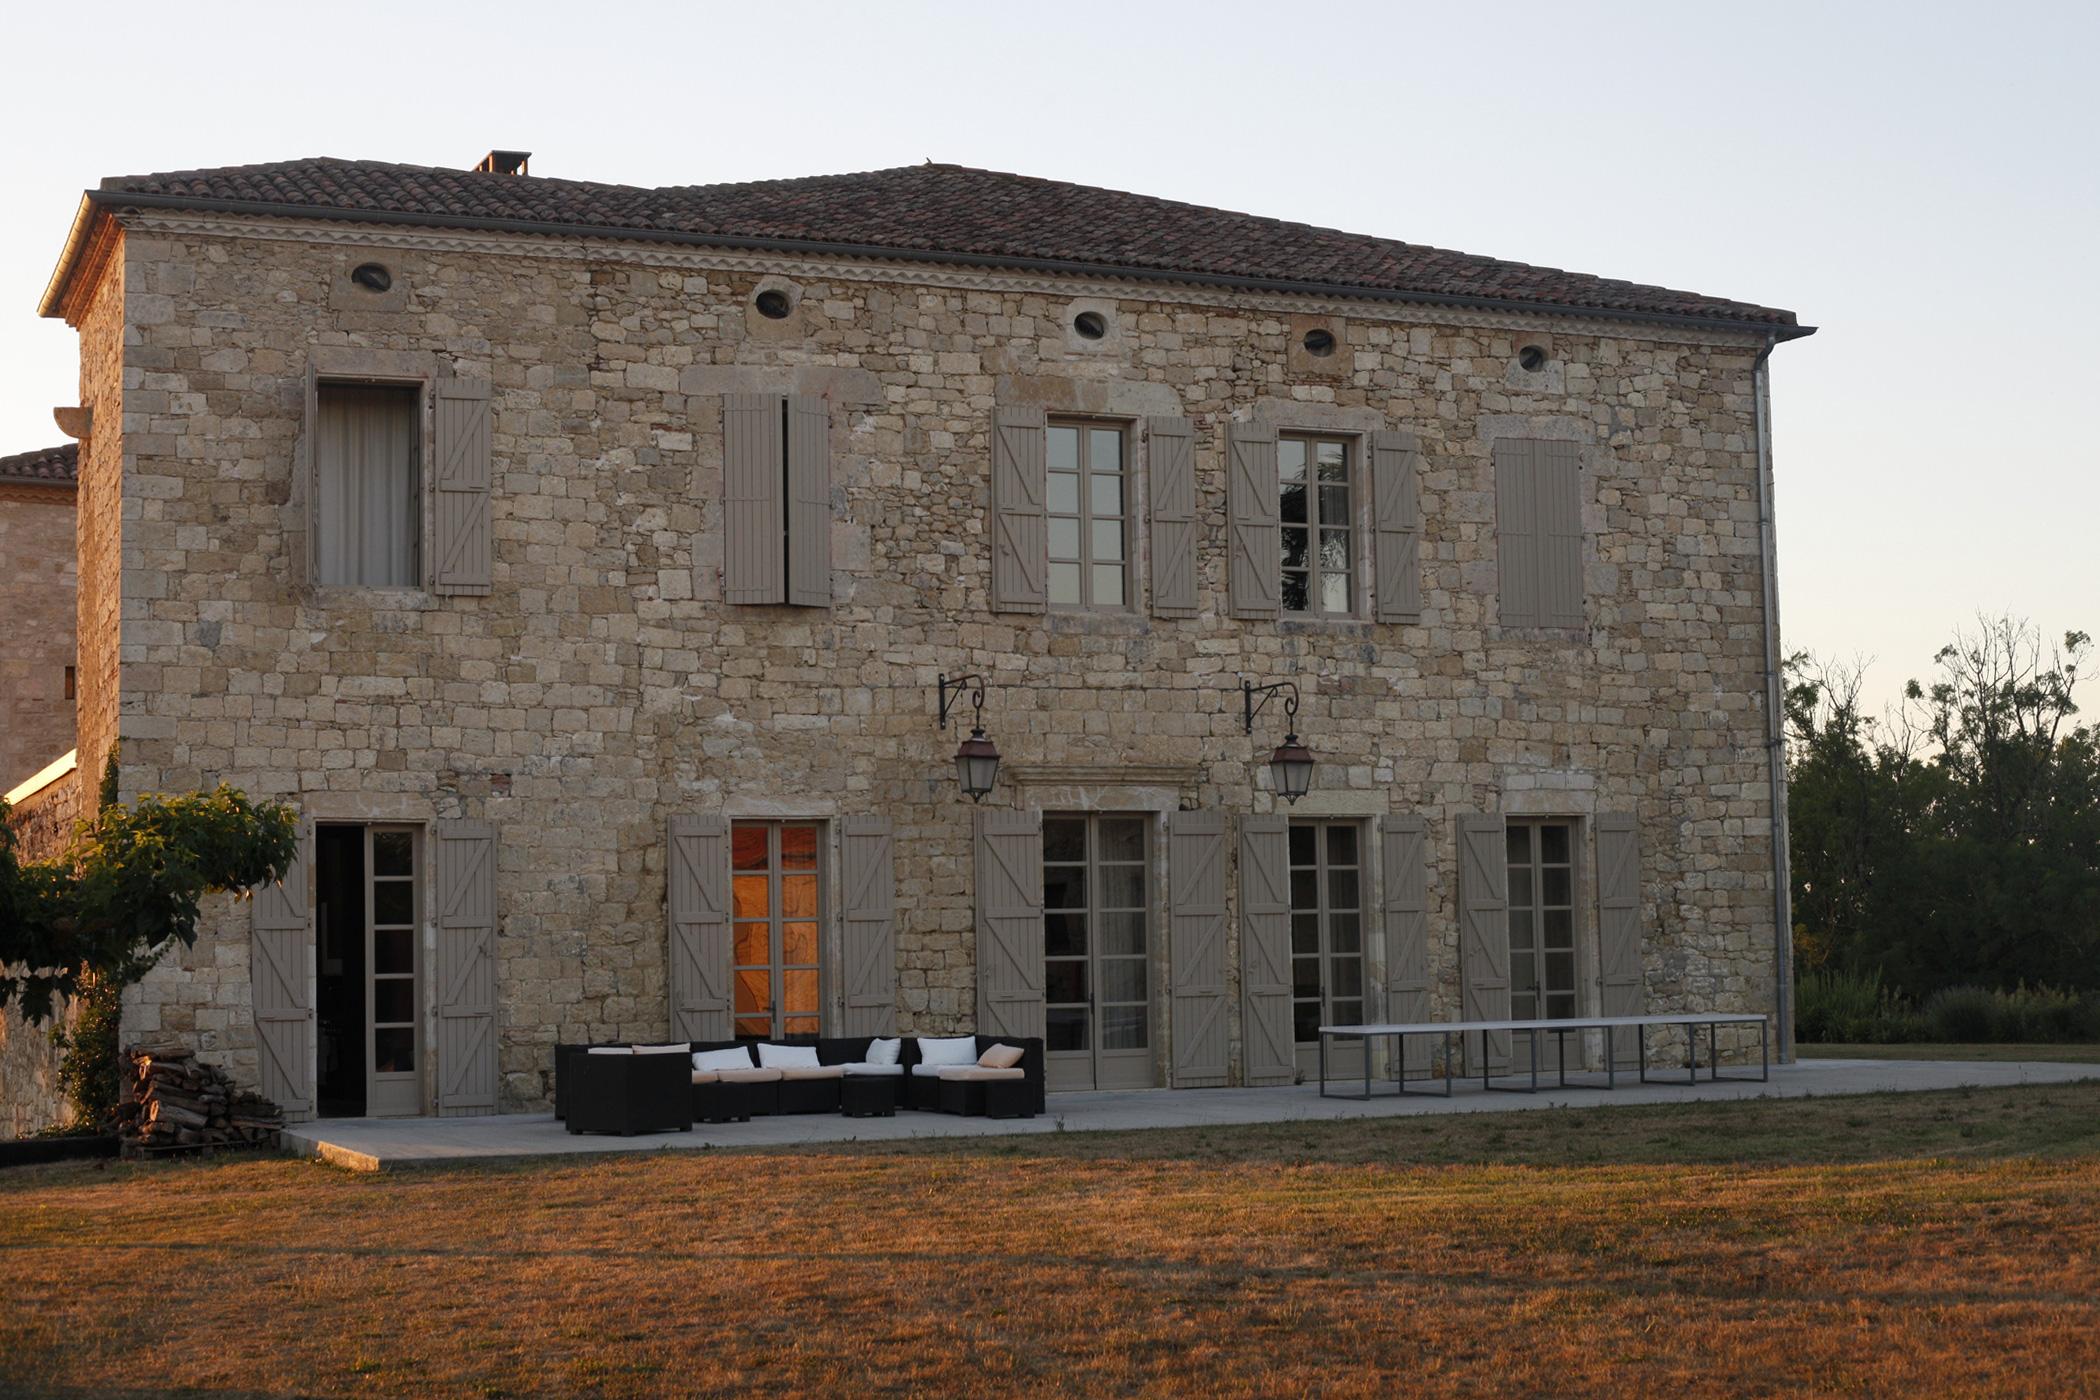 Engalin_Gascony_France_8339.jpg